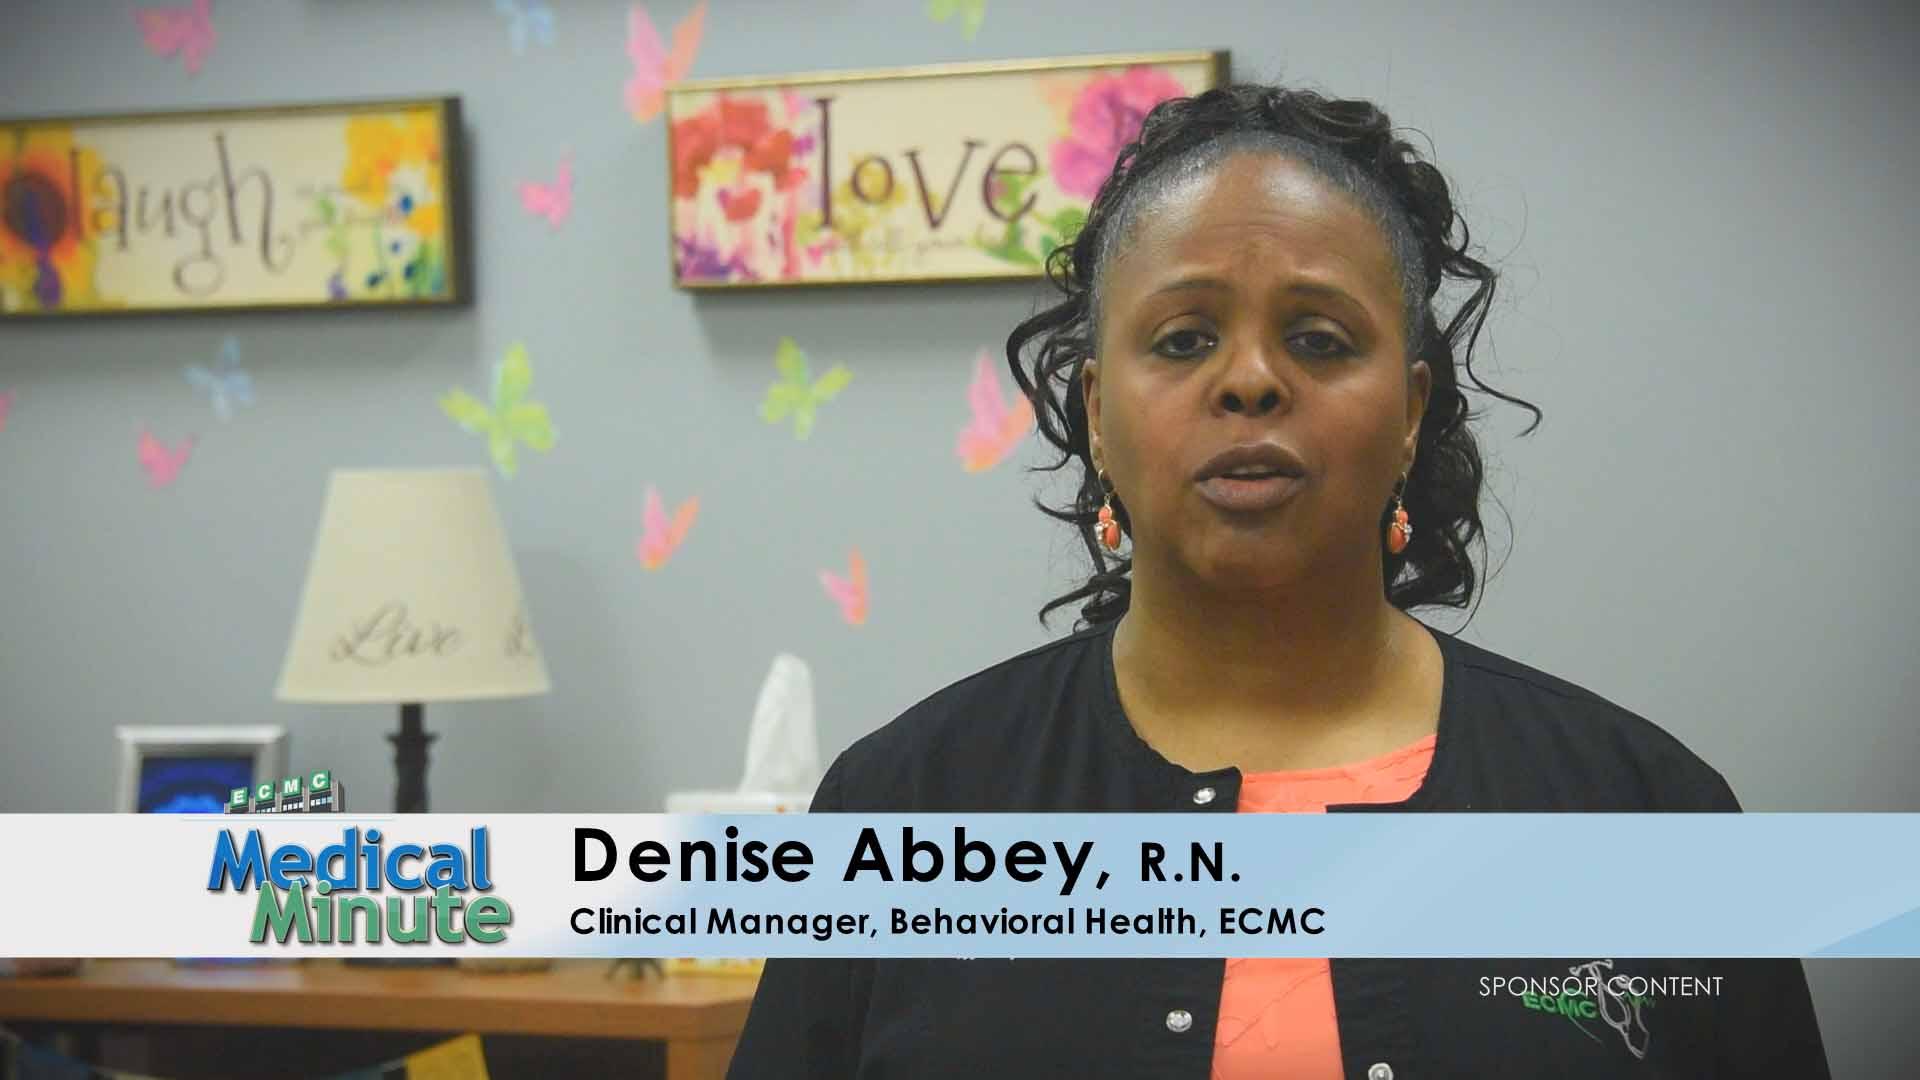 ECMC Medical Minute DeniseAbbey Depression 05.08.17